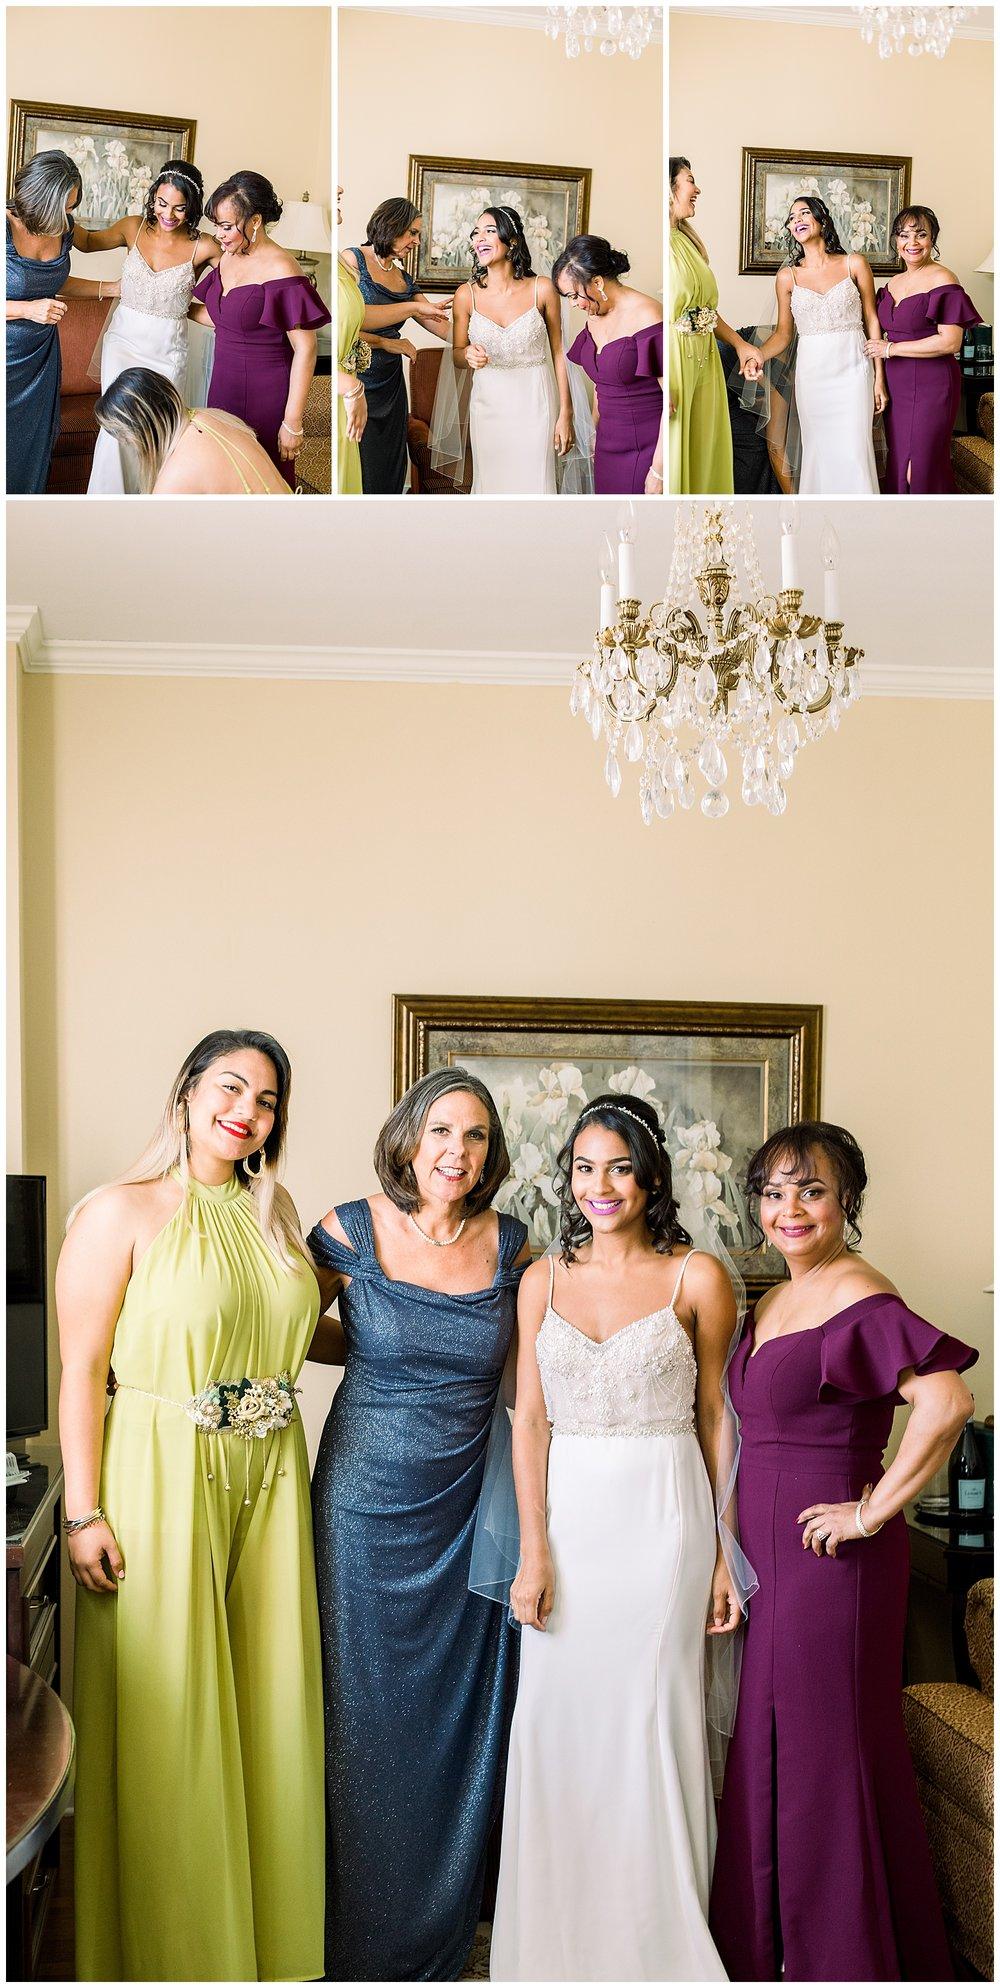 jessicafredericks_lakeland_tampa_wedding_purple_crazy hour_0011.jpg